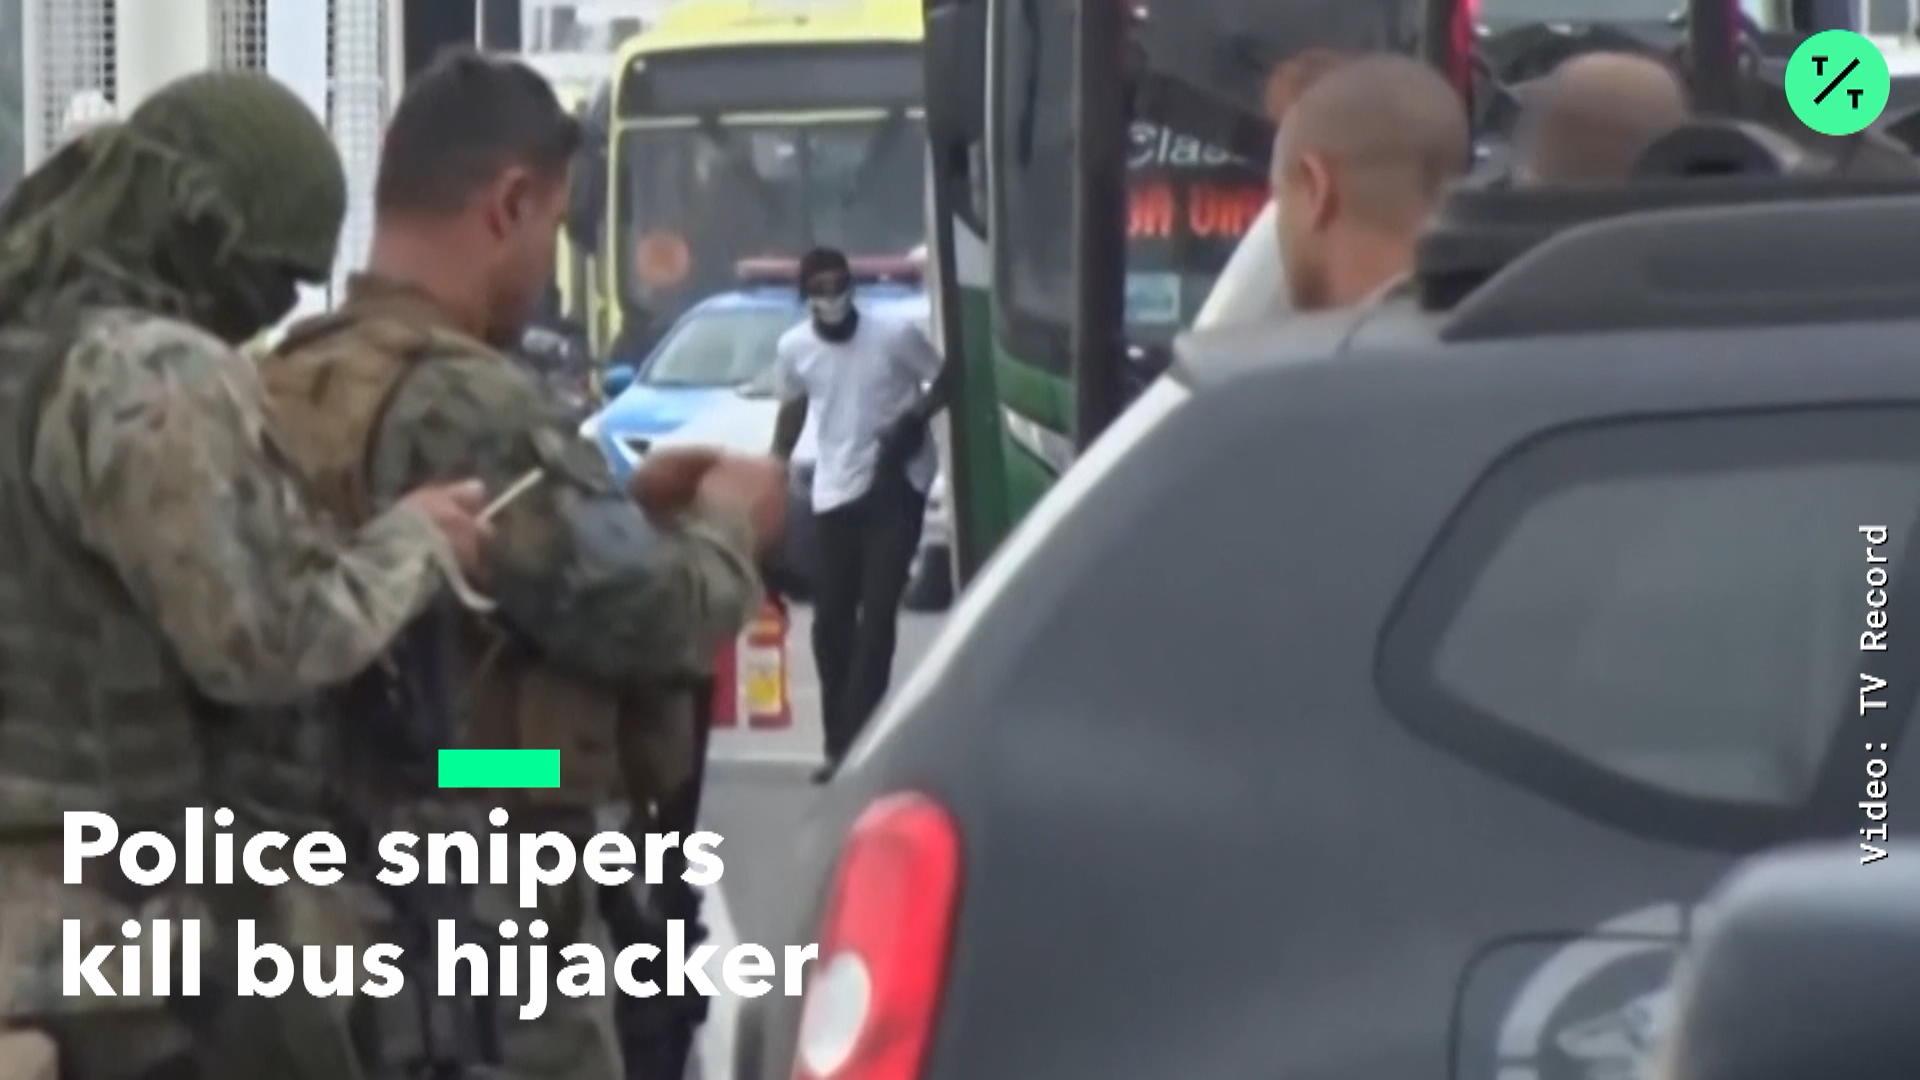 Snipers Shoot Buss Hijacker